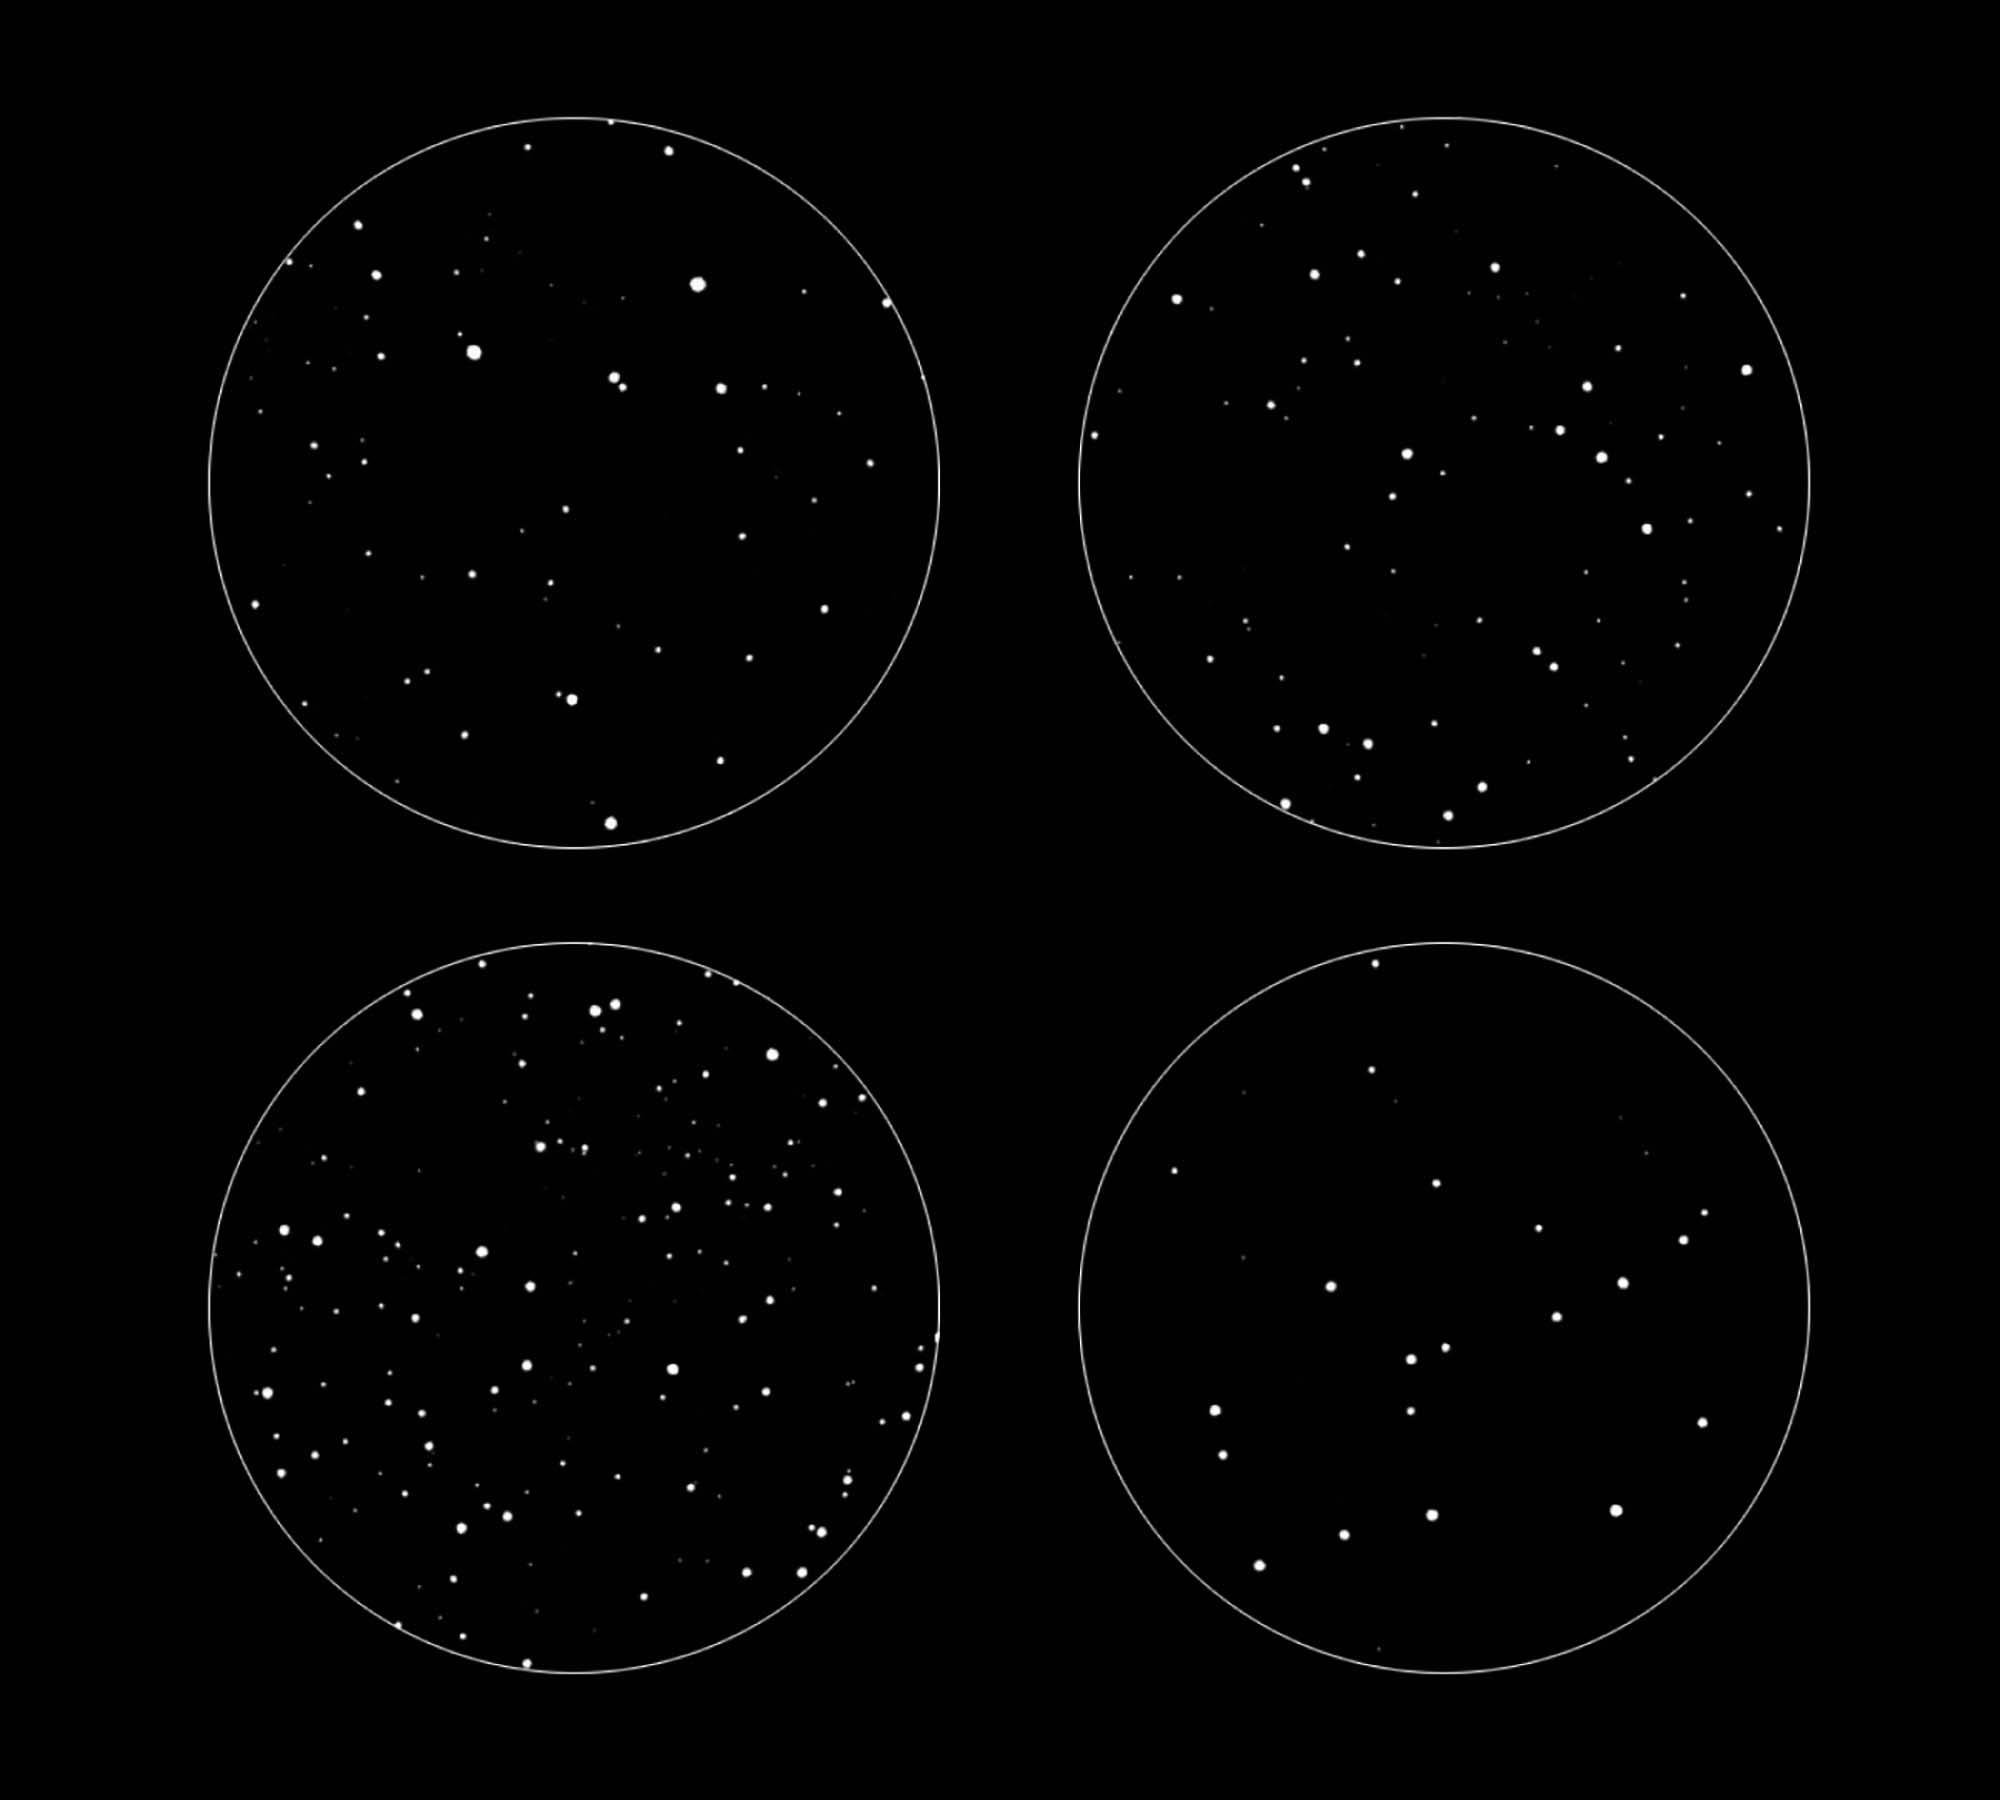 Star Patterns 5